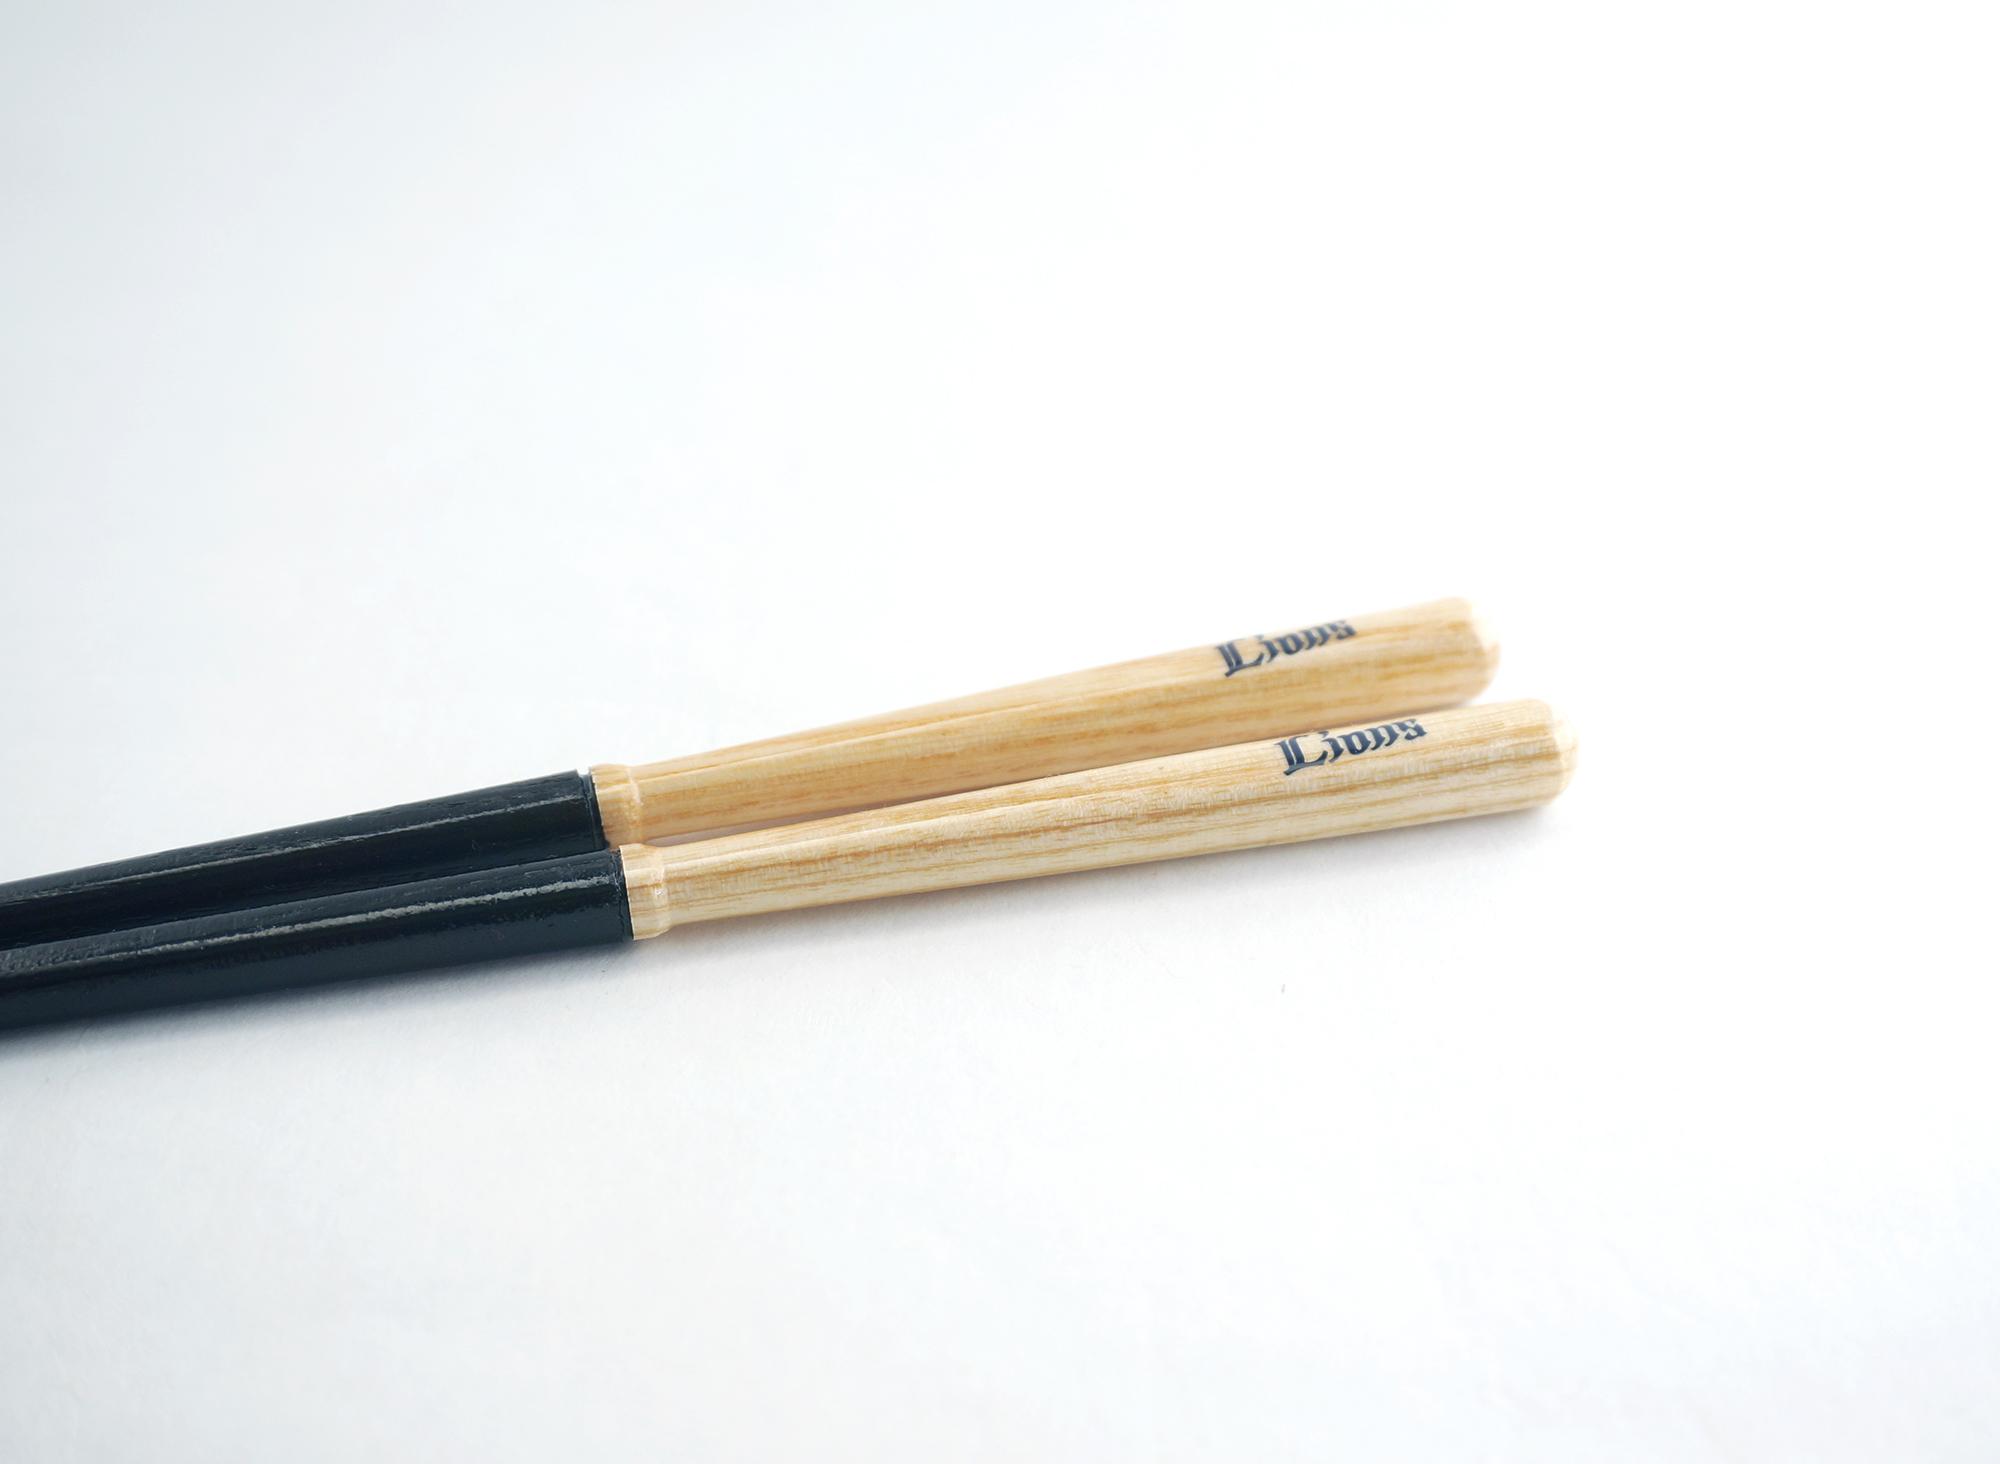 sp-hashilogo-20l